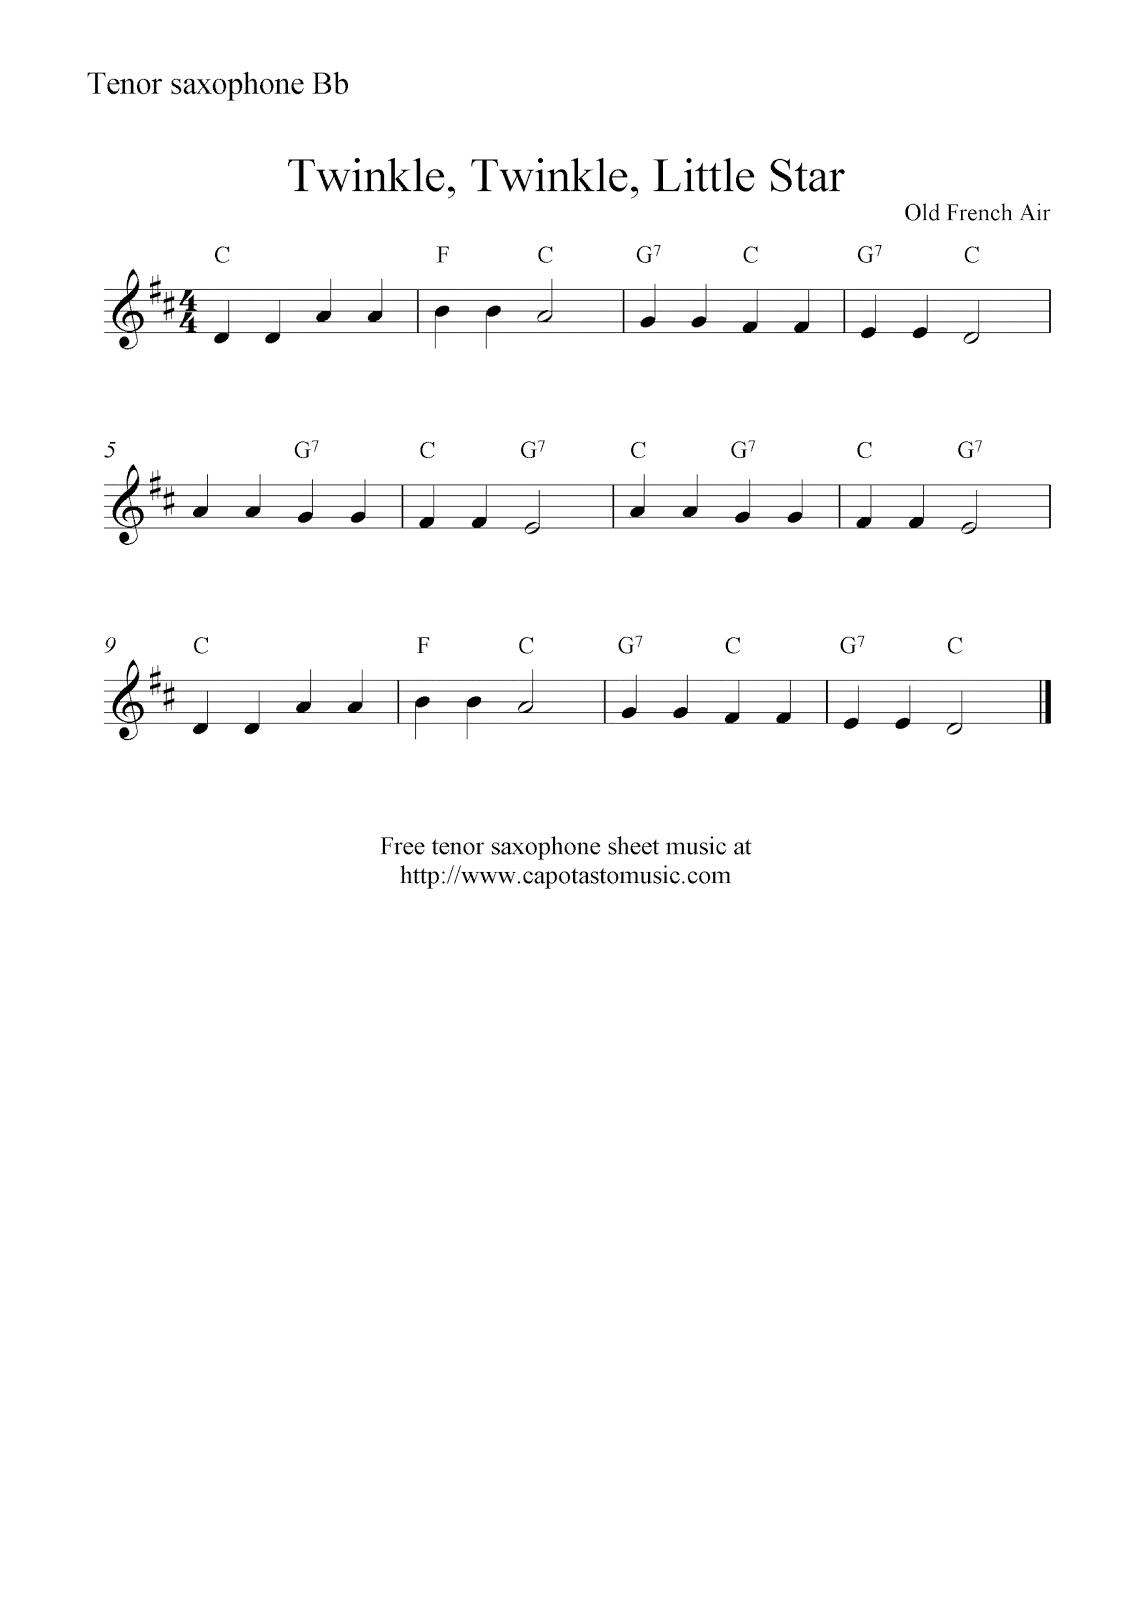 Twinkle Twinkle Sheet Music Ibovnathandedecker